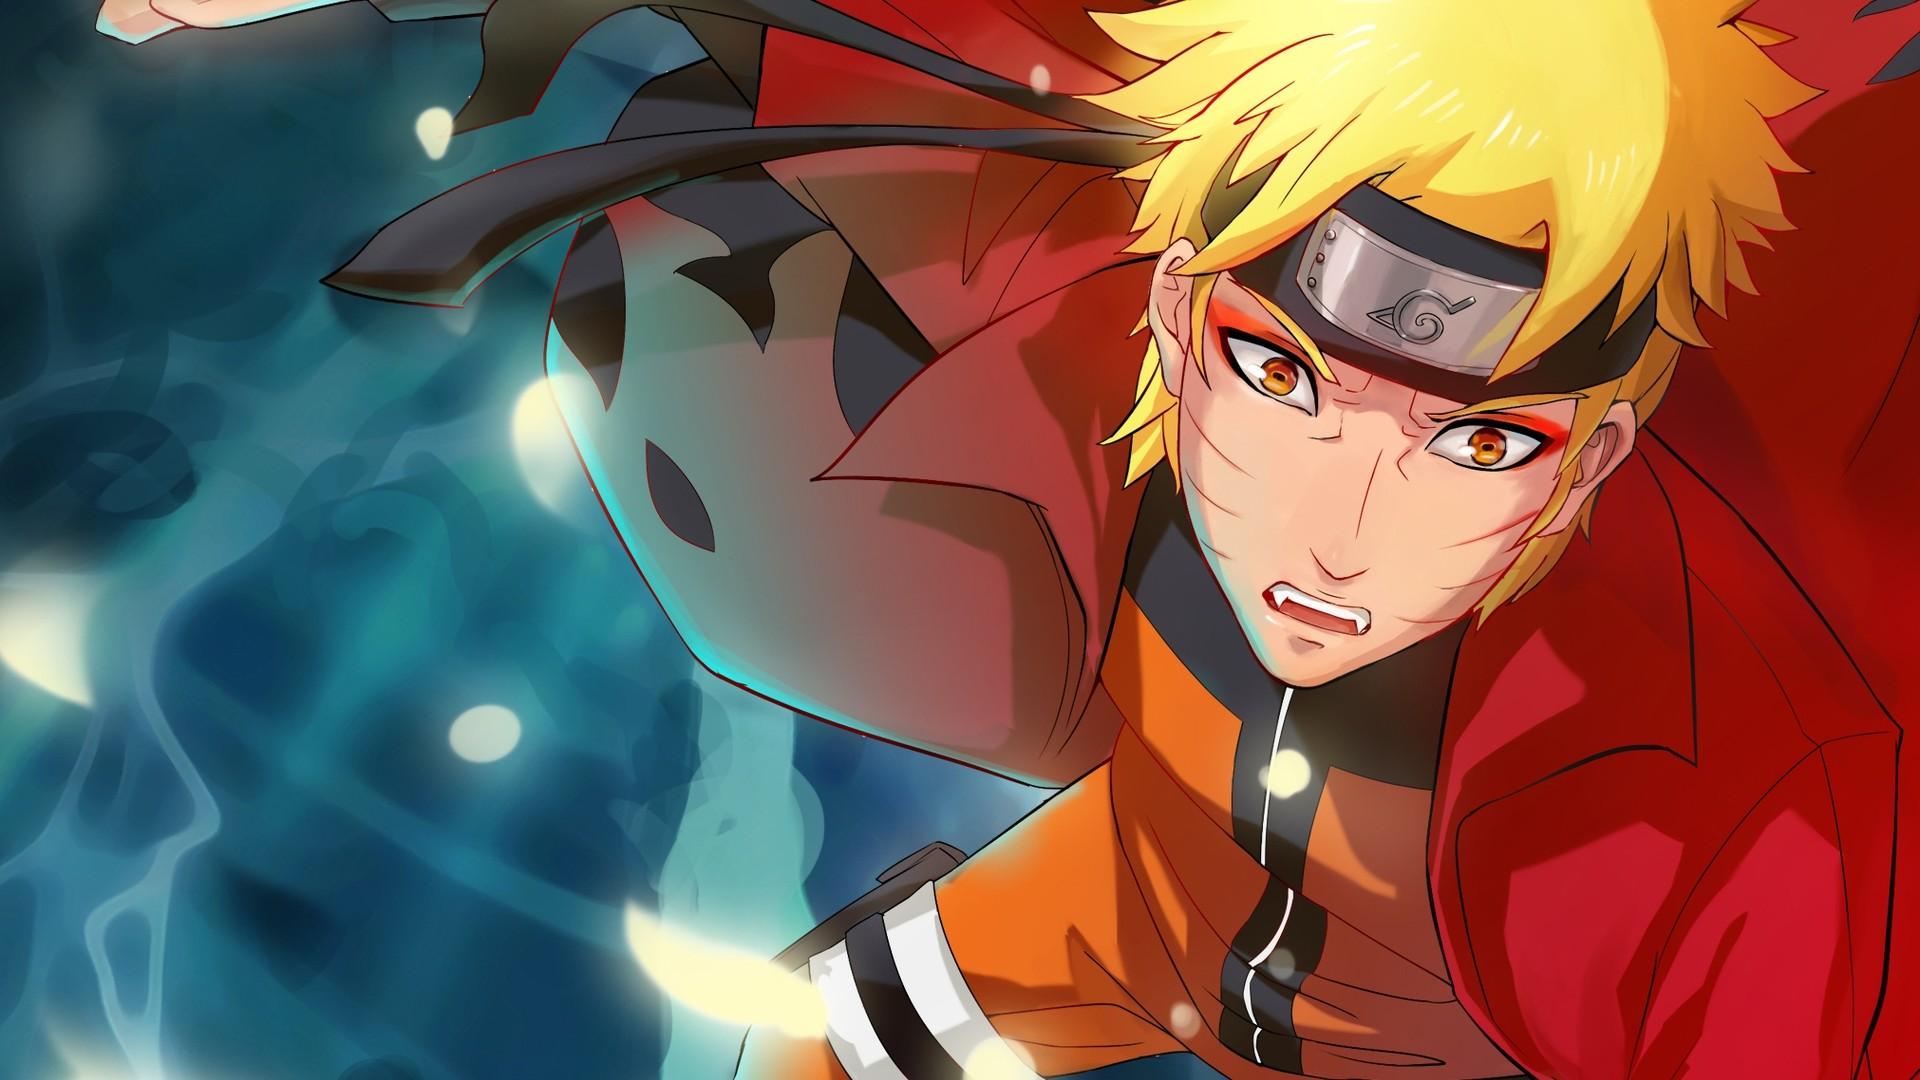 Naruto wallpapers Naruto Pictures Naruto Images Naruto